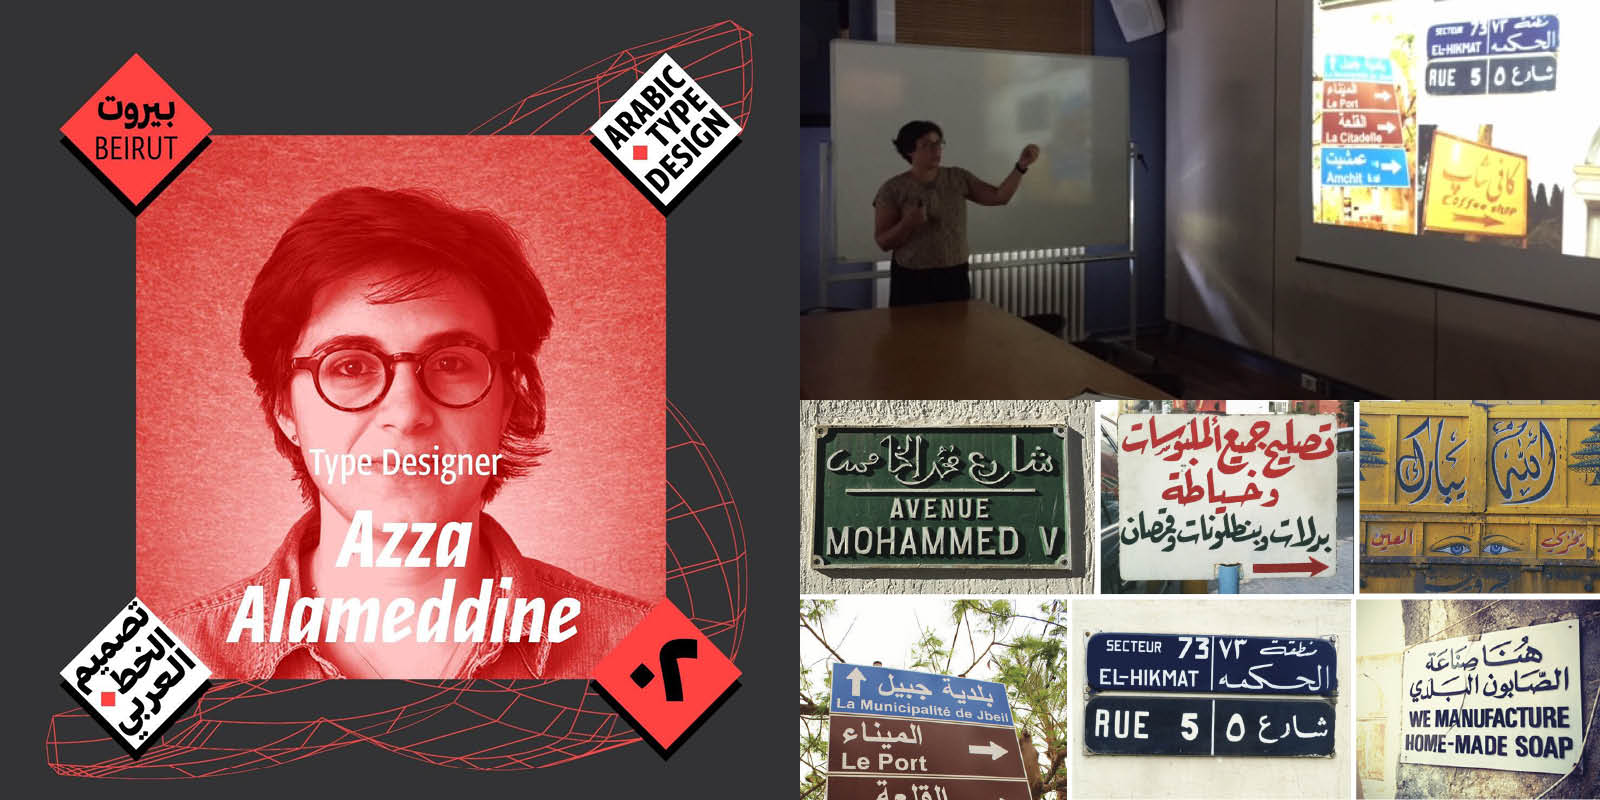 Azza Alameddine Workshop